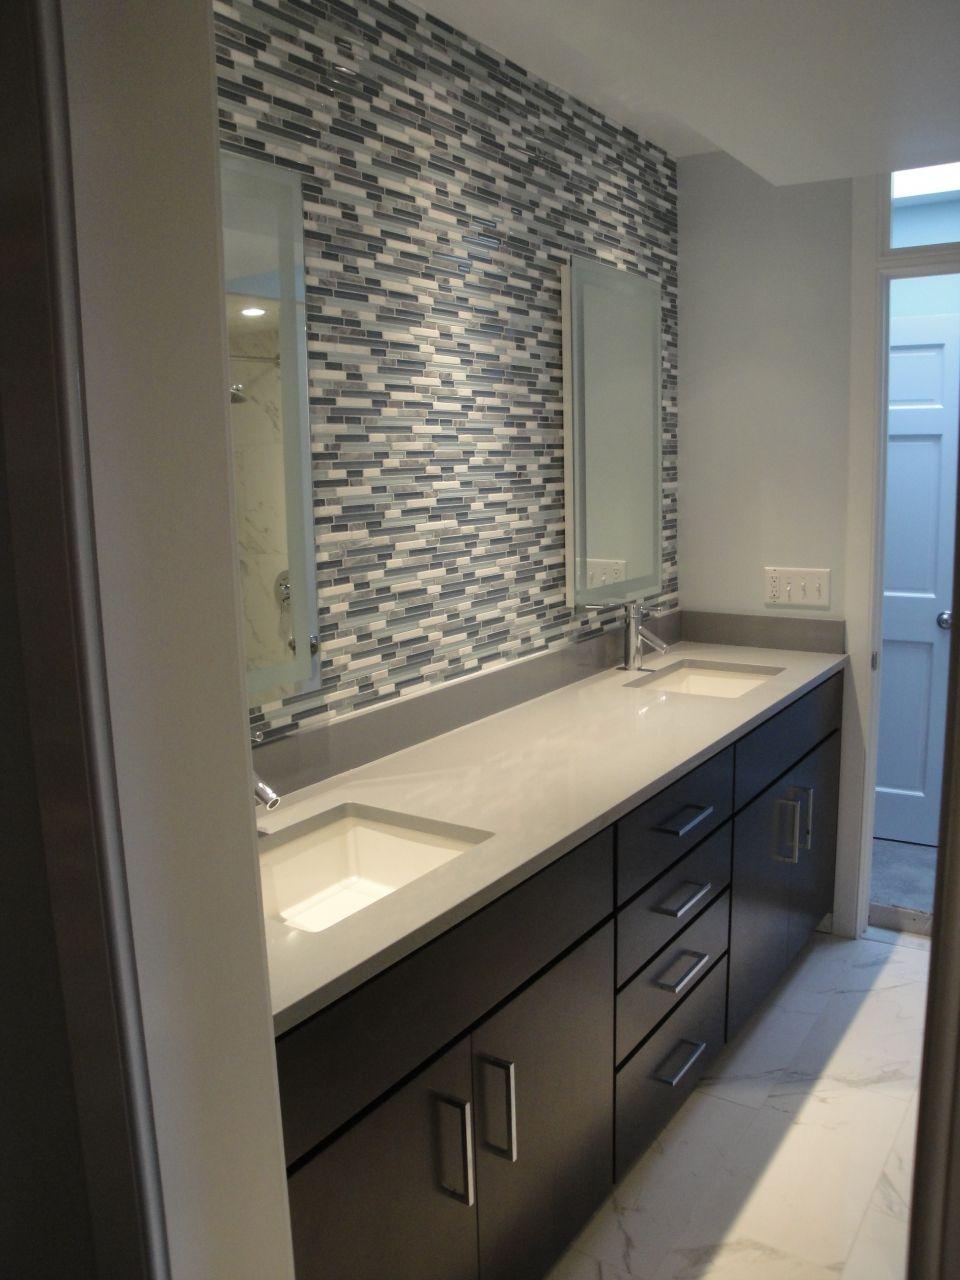 Private Residence Bathroom - Alexandria, VA Project | Architectural Ceramics